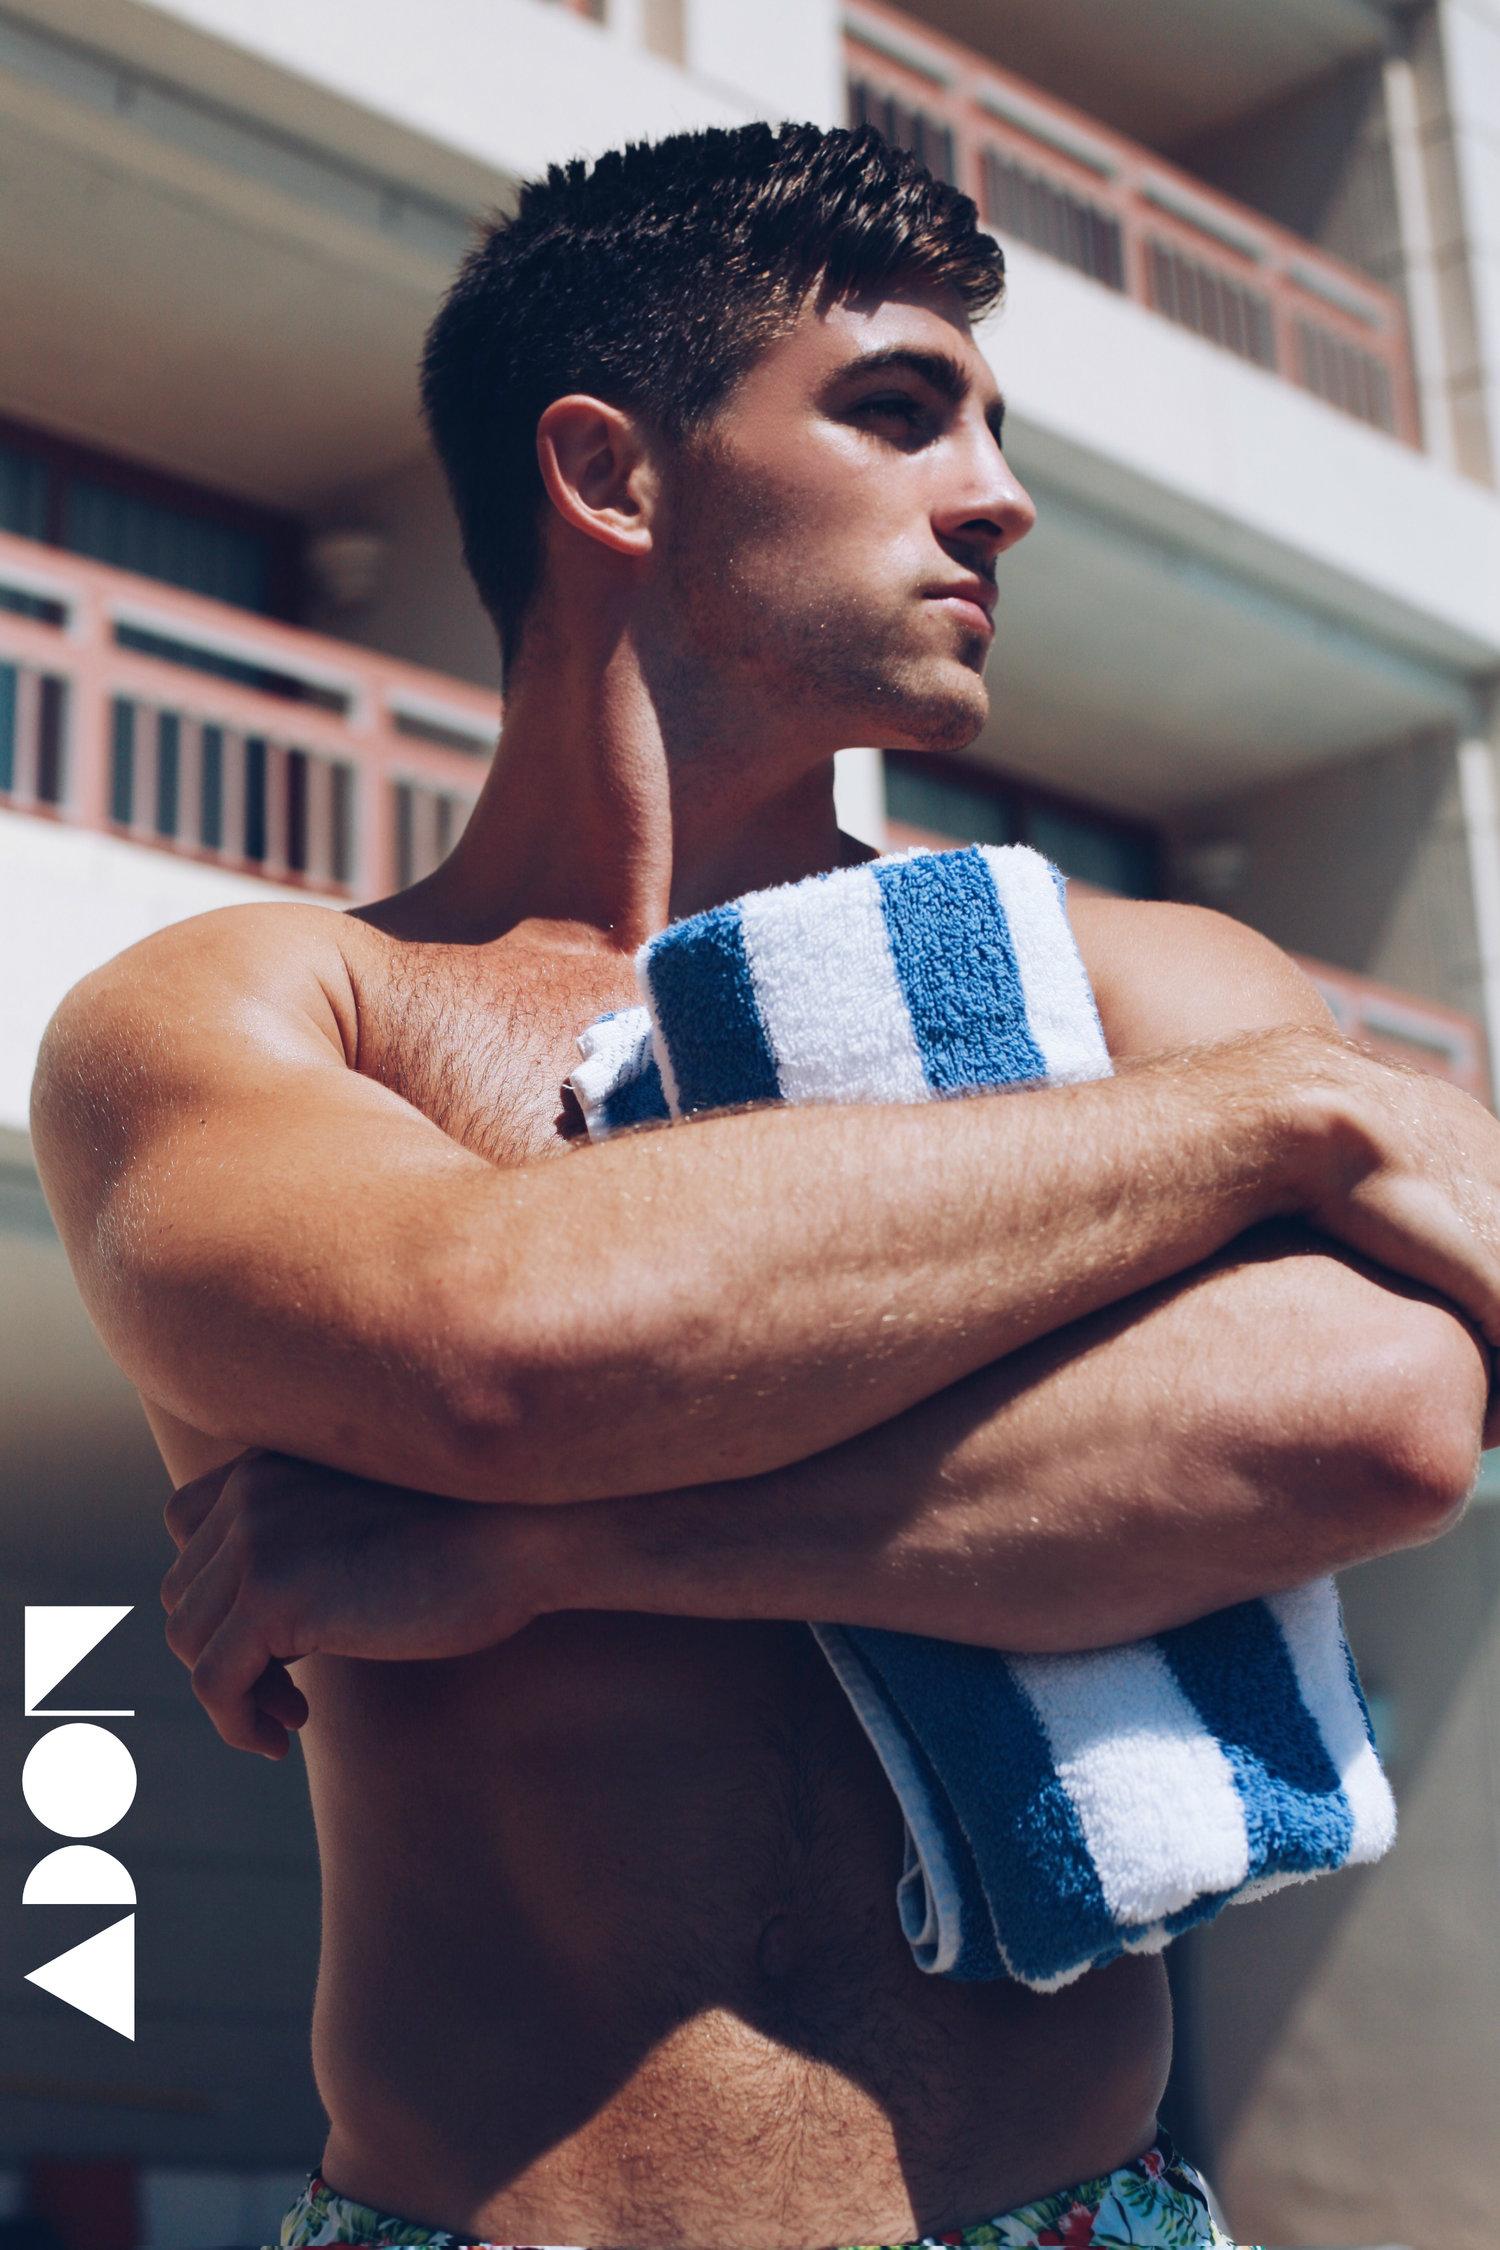 Adon Exclusive: Model Tony B. By Mark Mendez